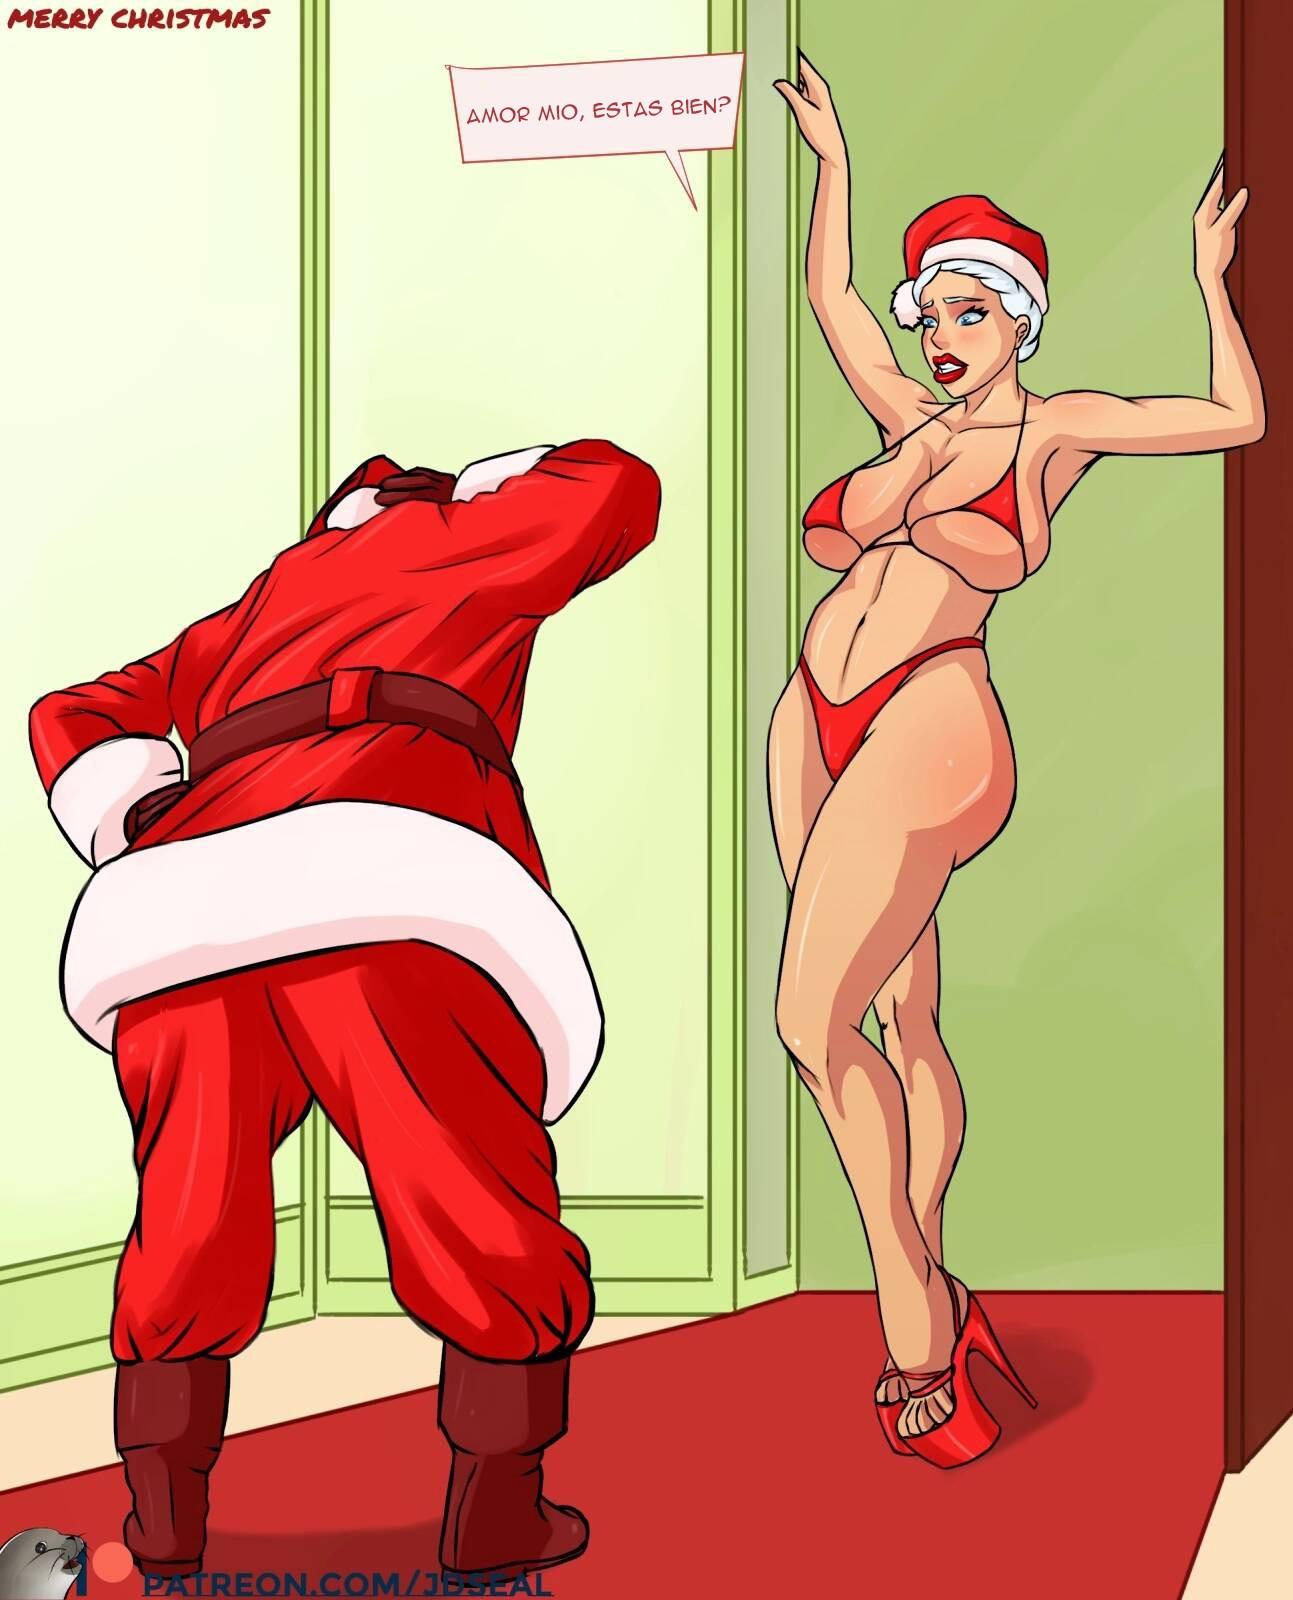 Merry-Christmas-02.jpg